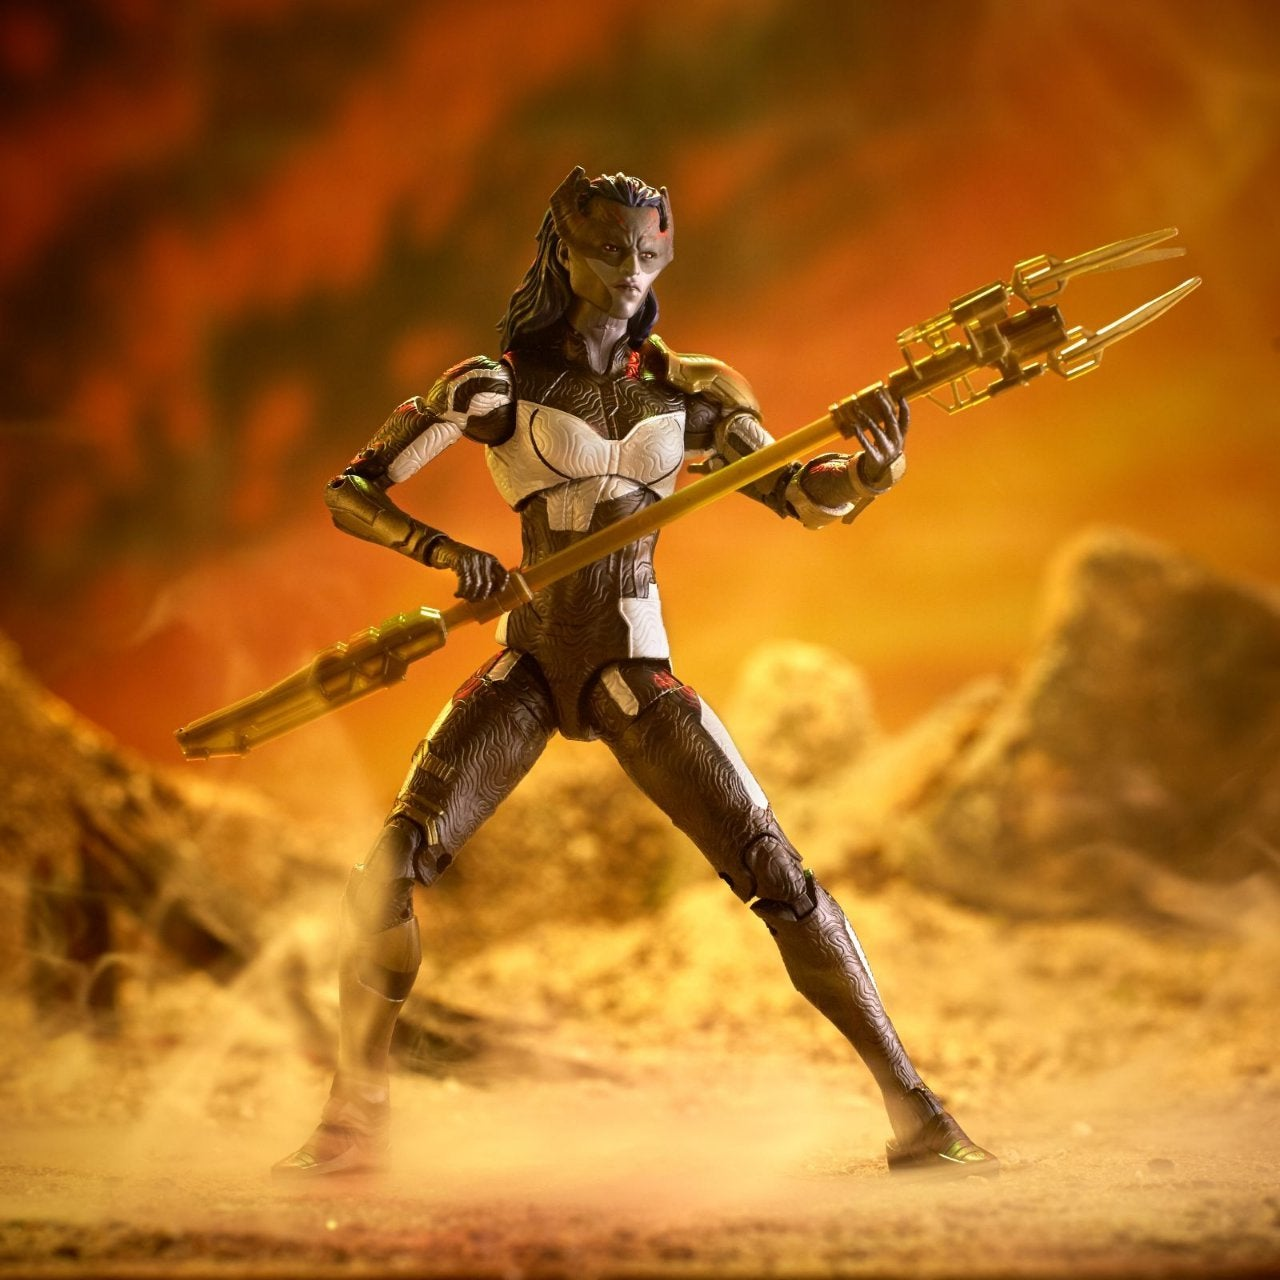 Avengers Infinity War Hasbro Figures - Proxima Midnight